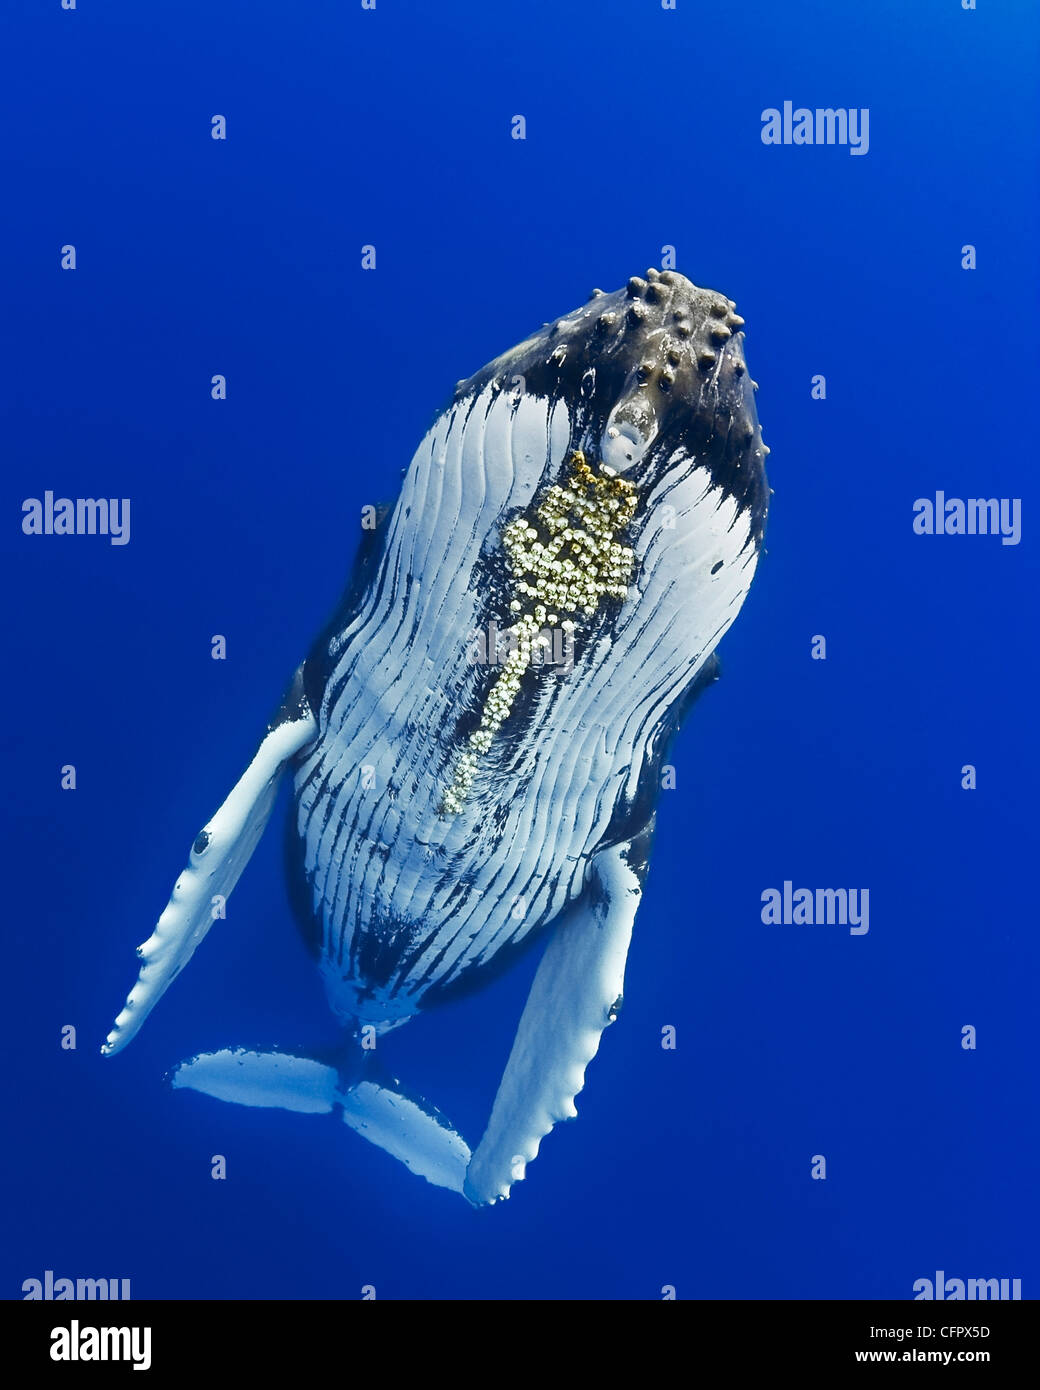 humpback whale, Megaptera novaeangliae, with parasitic acorn barnacles attached under chin, Cornula diaderma, Hawaii, USA Stock Photo